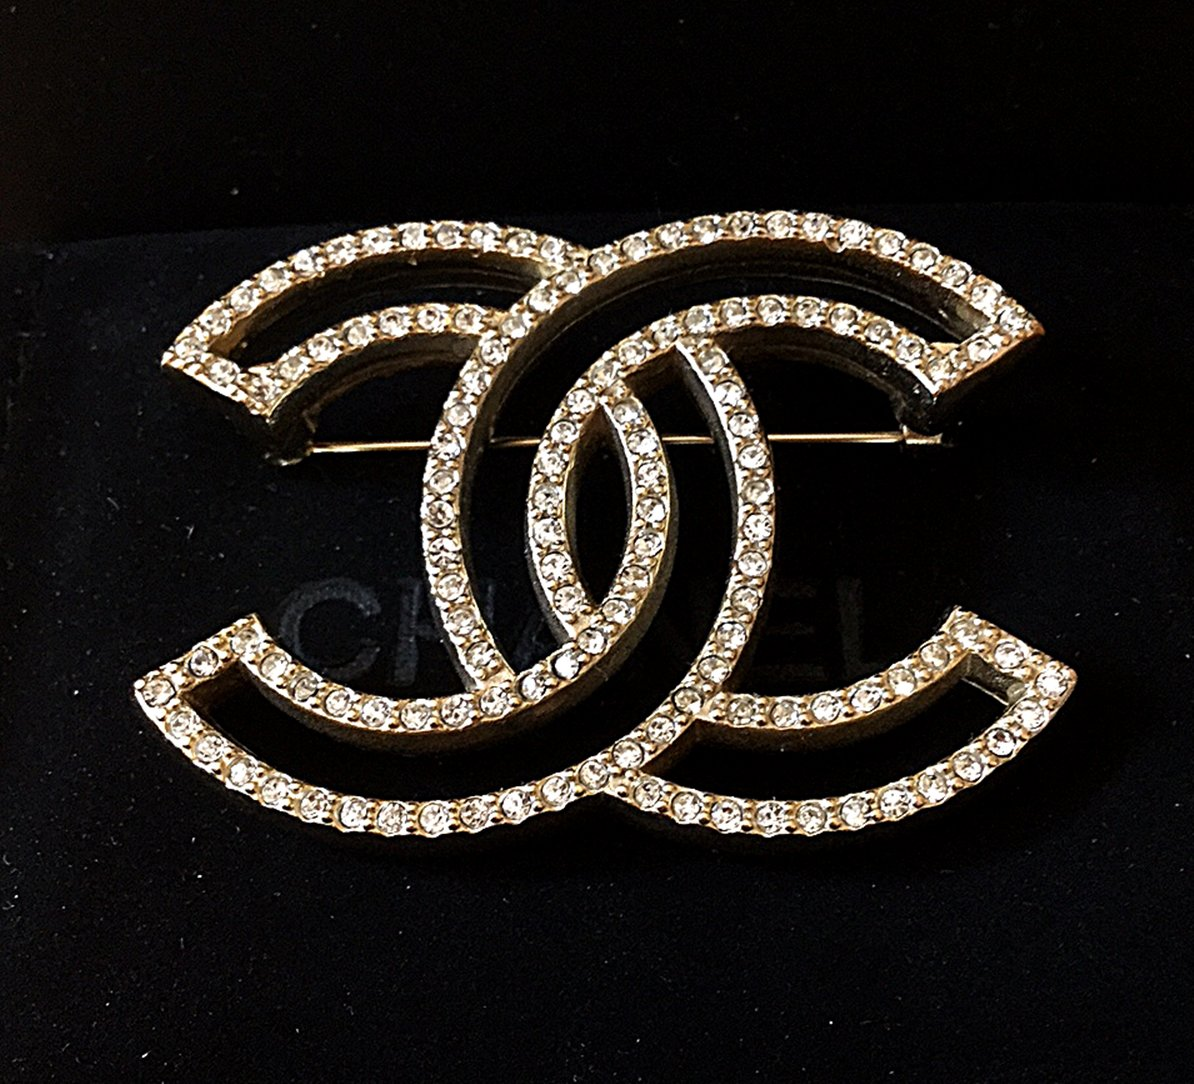 CHANEL Pale Gold Crystal Brooch Pin HOLLOW Design Hallmark Authentic NIB